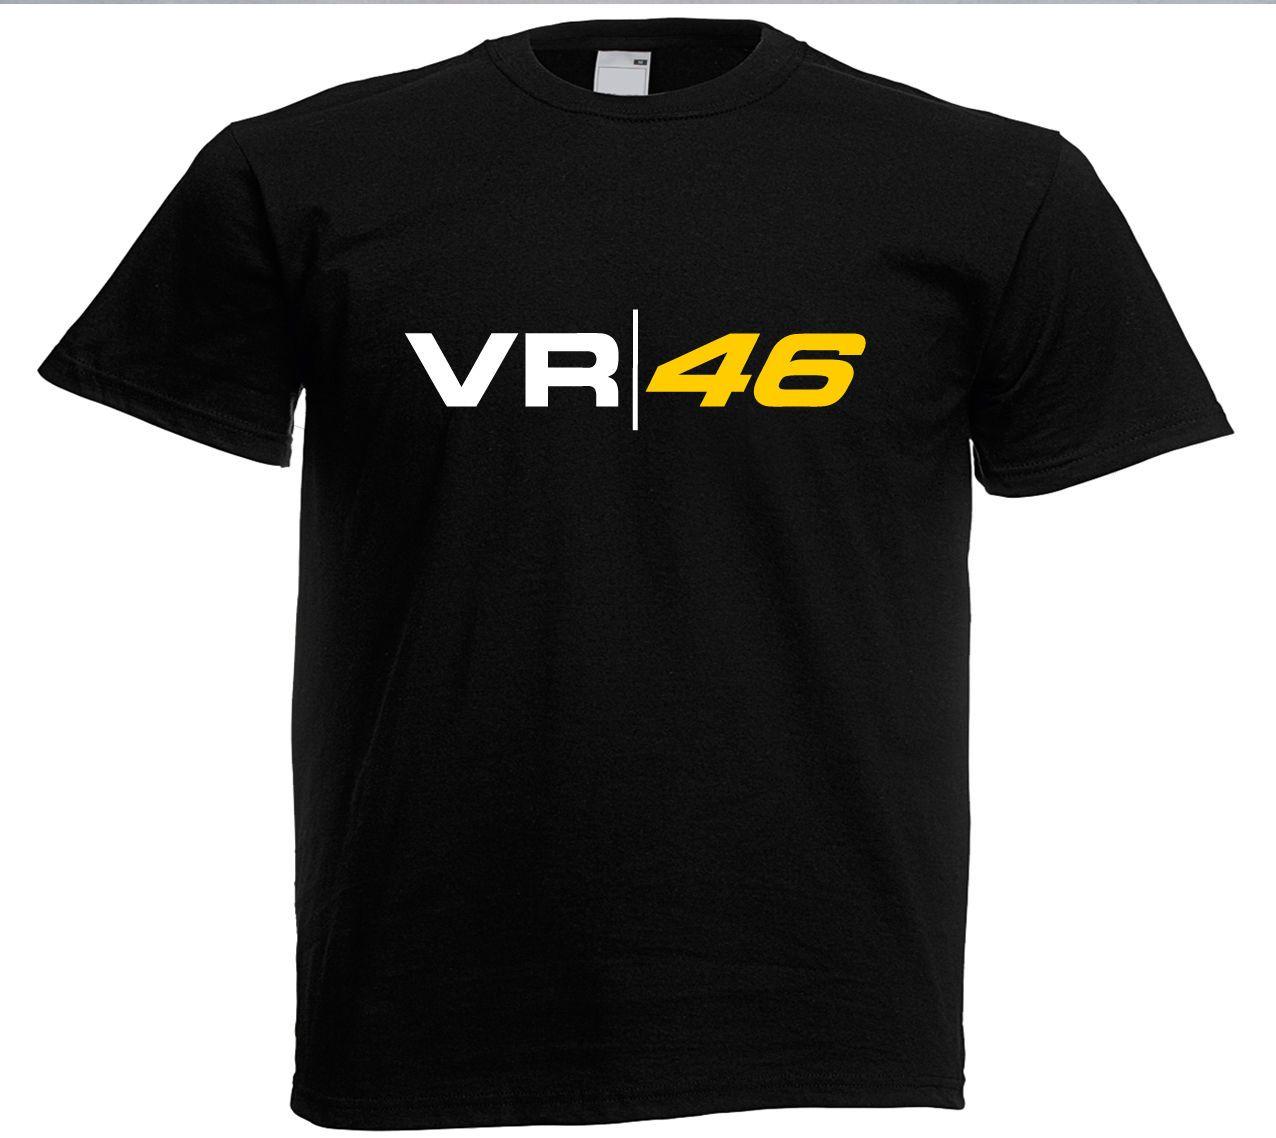 Grosshandel Valentino Rossi T Shirt Moto Gp Alle Zeit Klassiker Alle